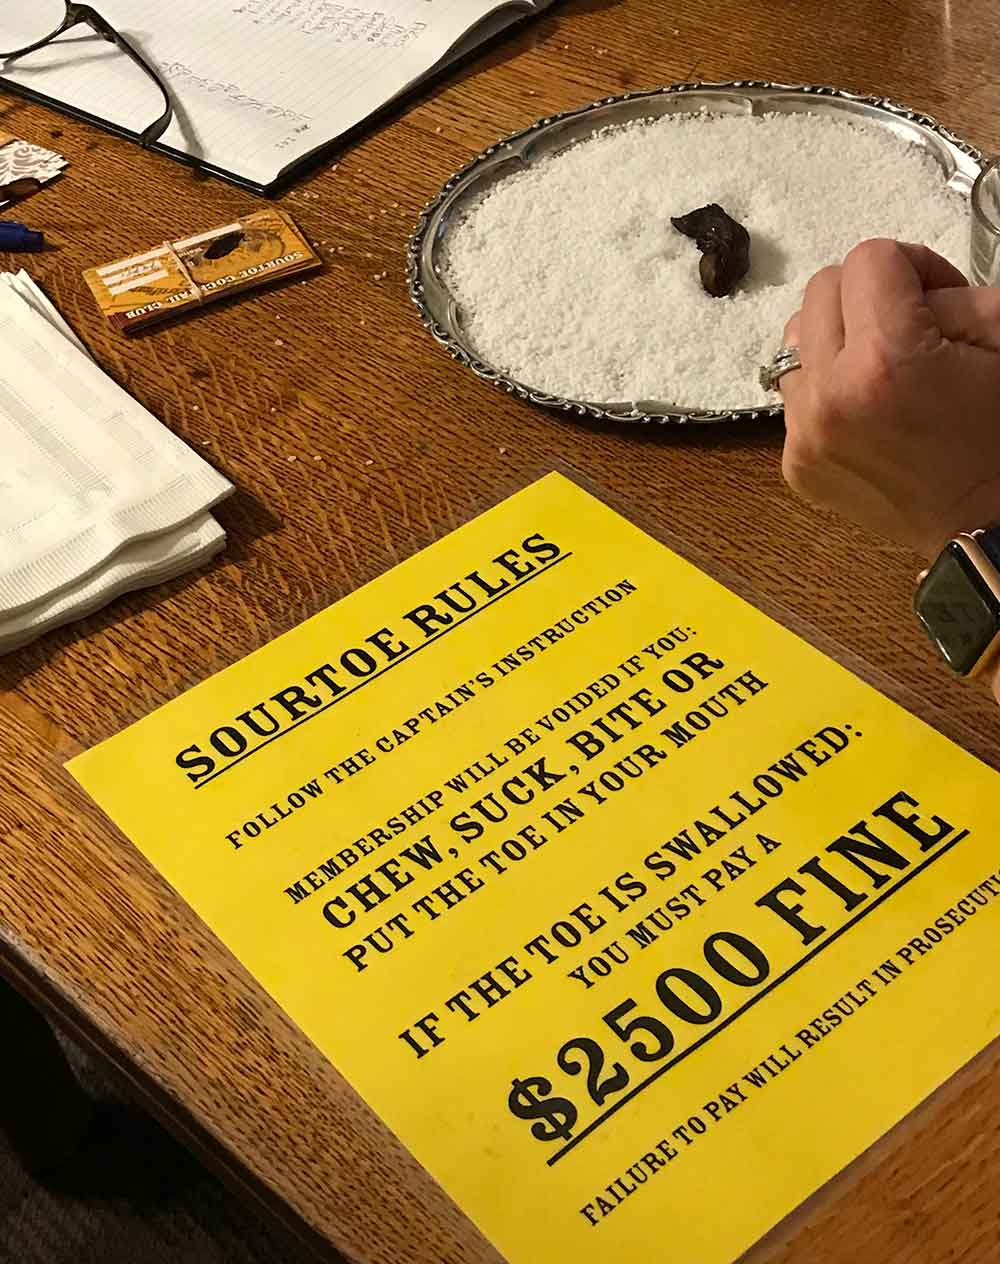 Dawson City sourtoe rules